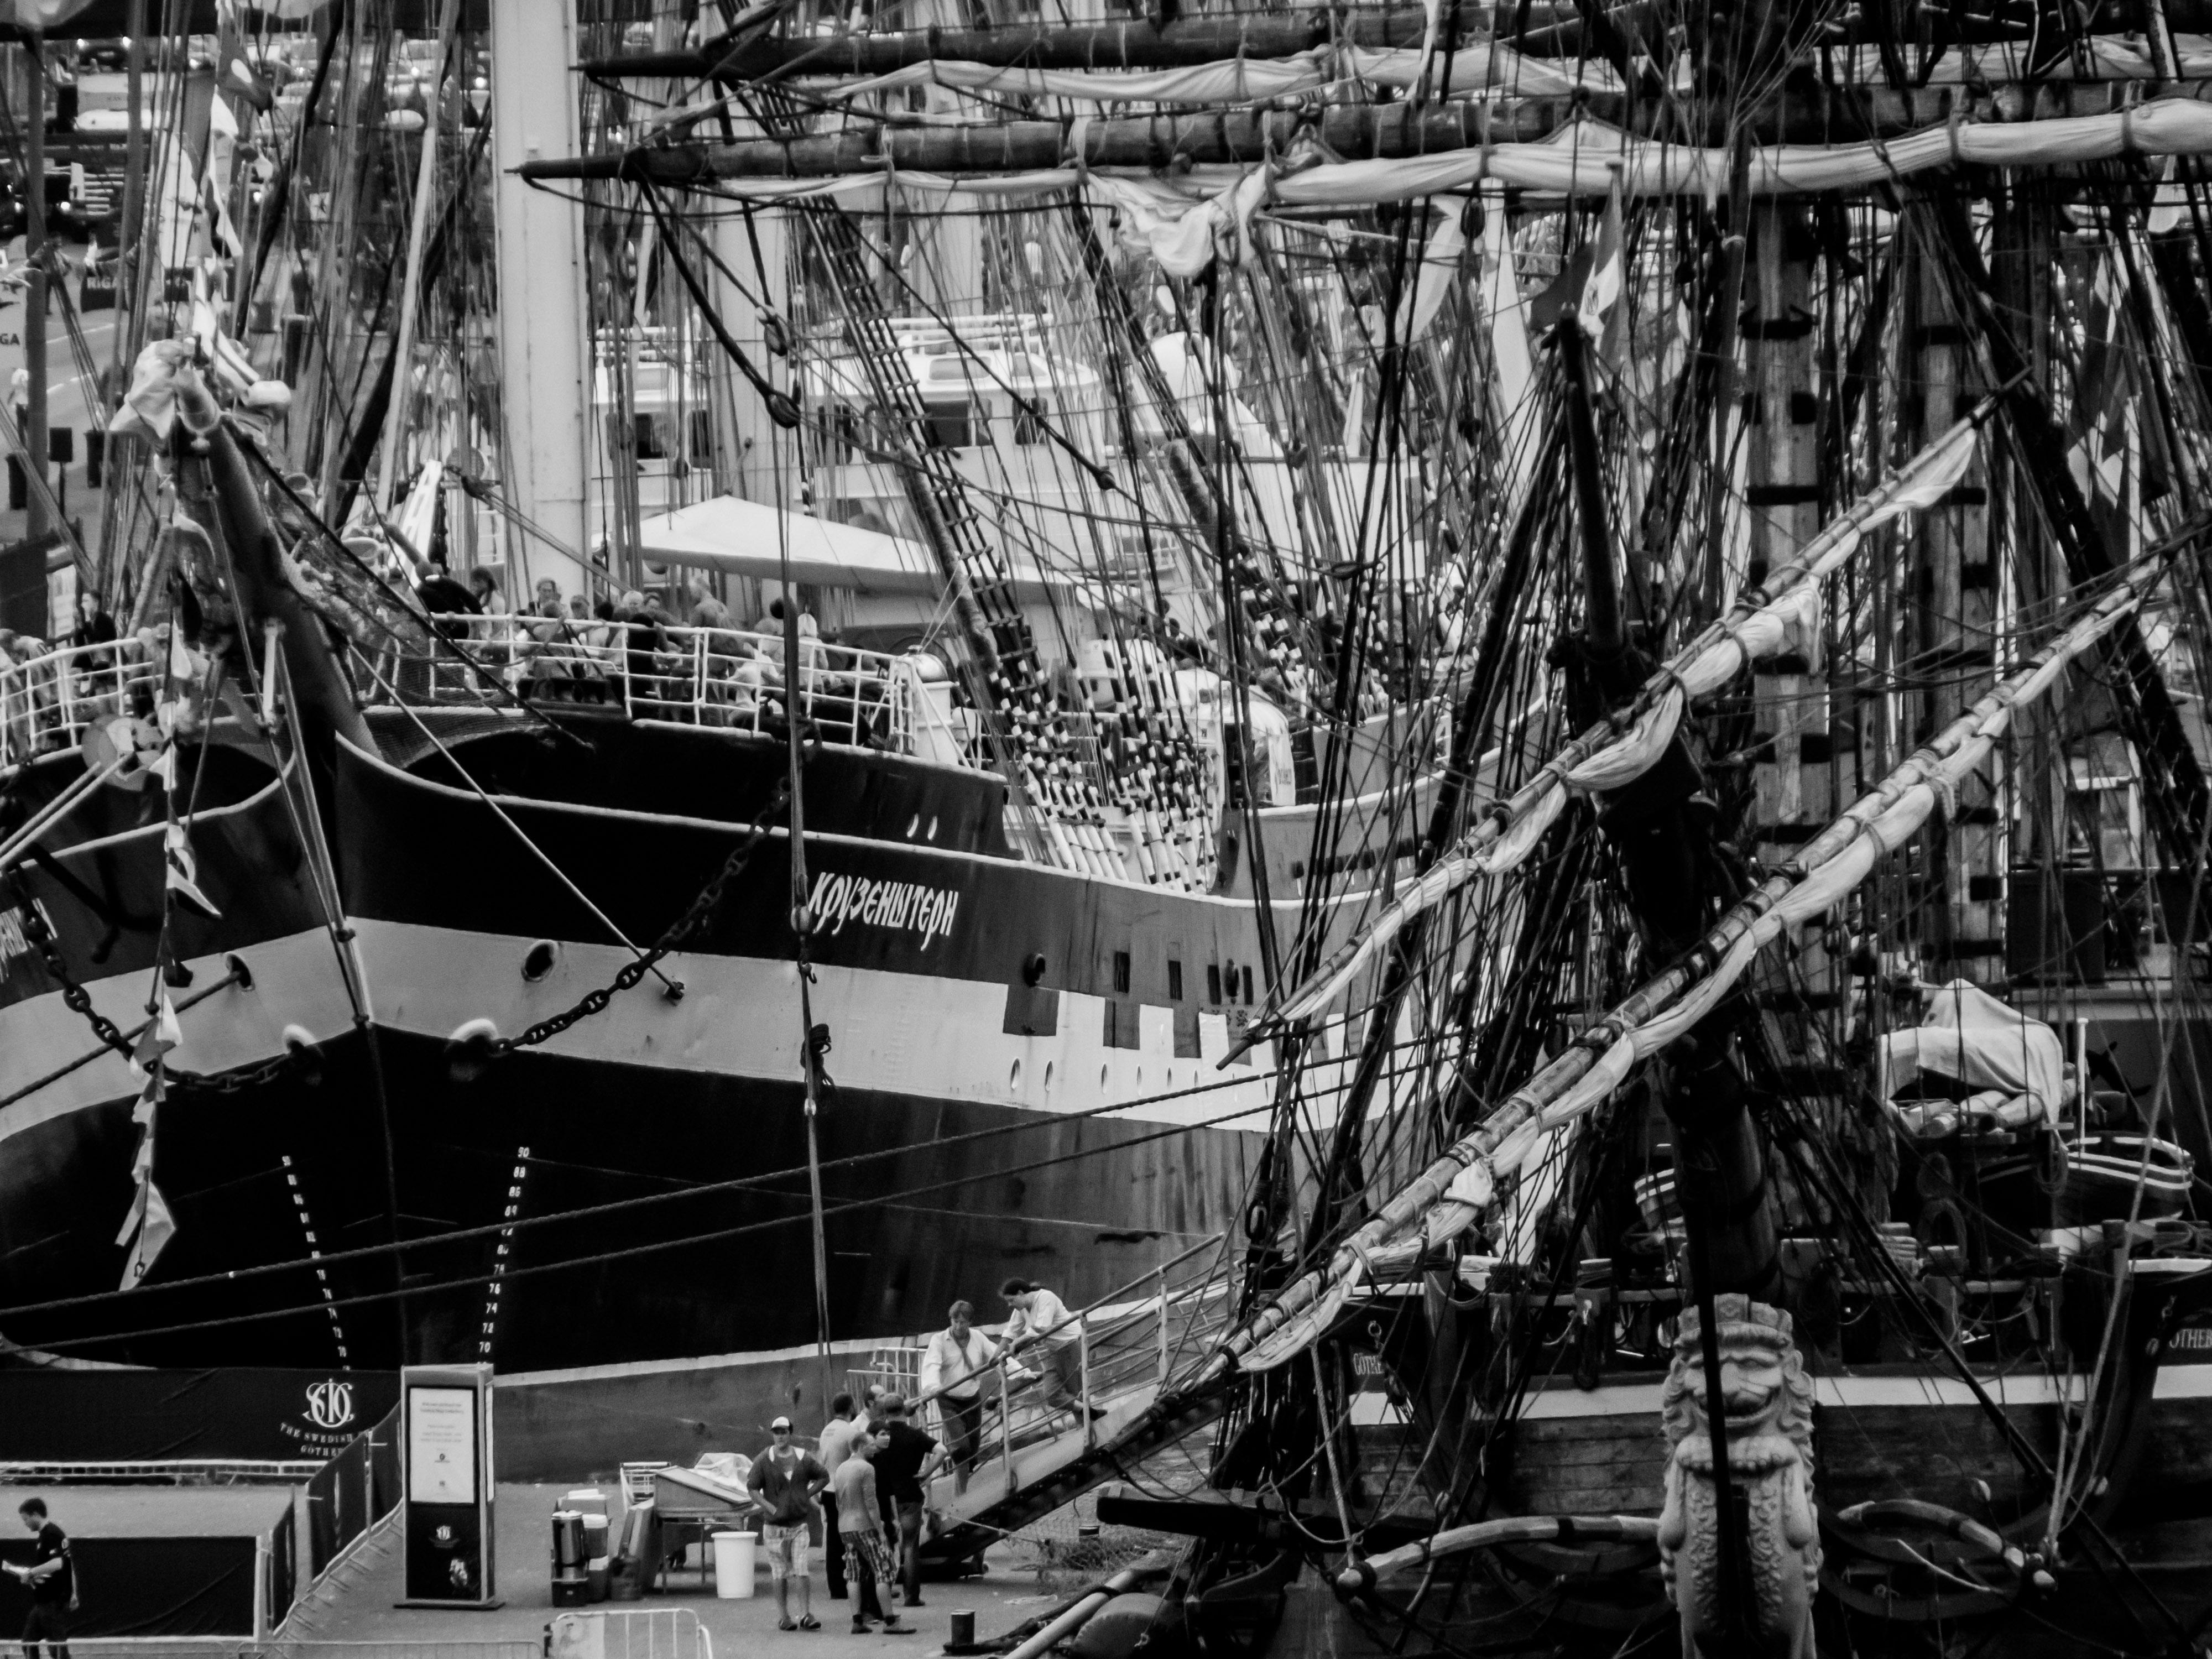 Ship, 2013, River, Vessel, Theme, HQ Photo